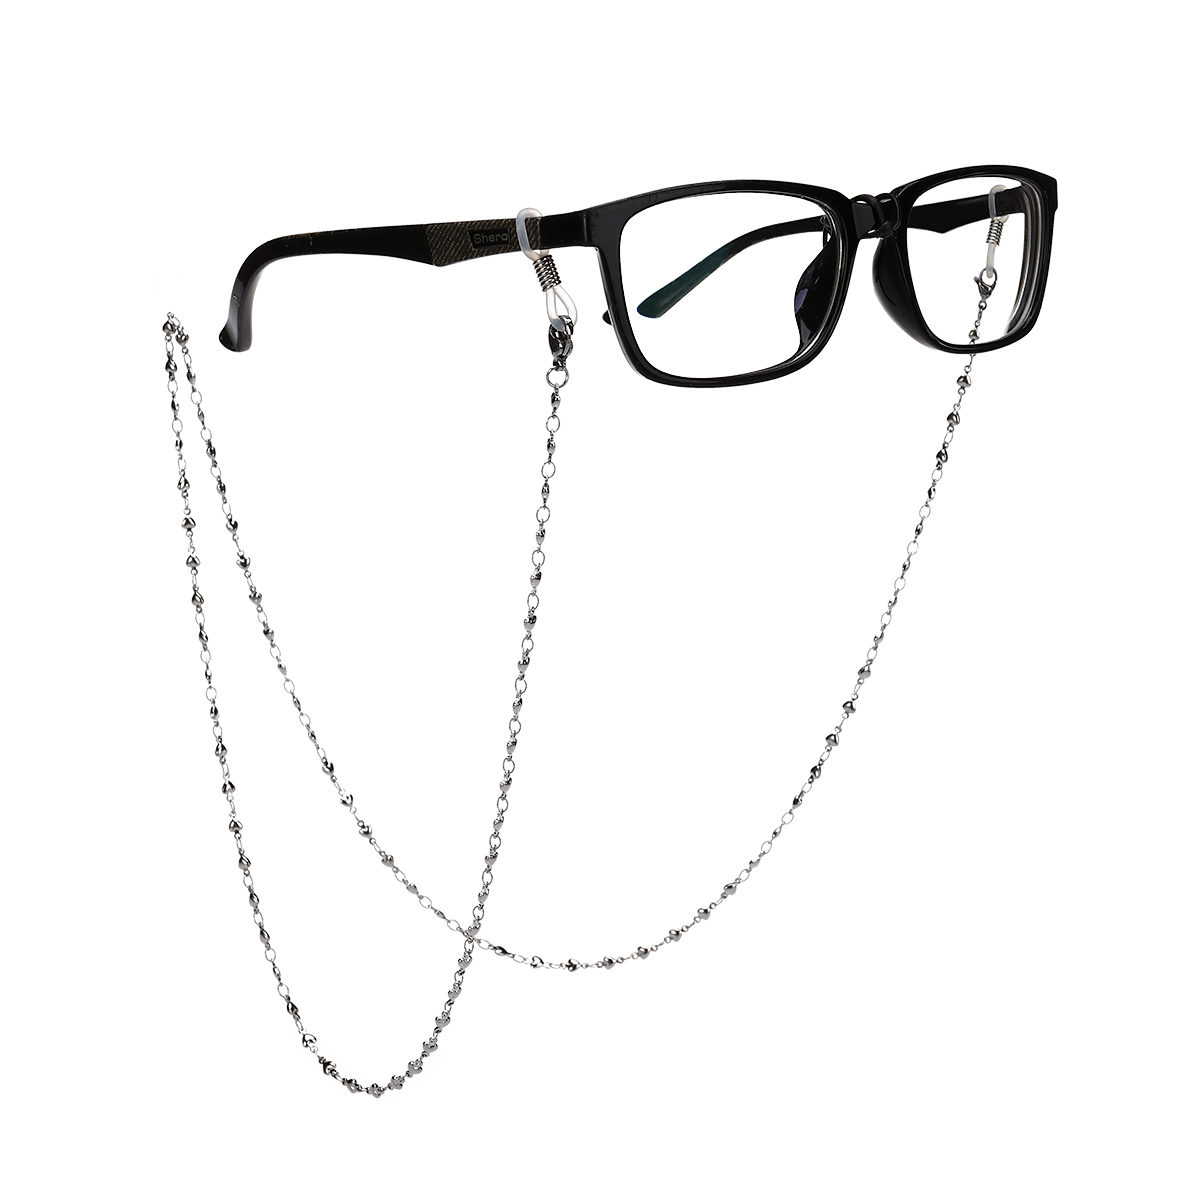 WINOMO Bronze Eyeglasses Chain Sunglasses Holder Strap Holder